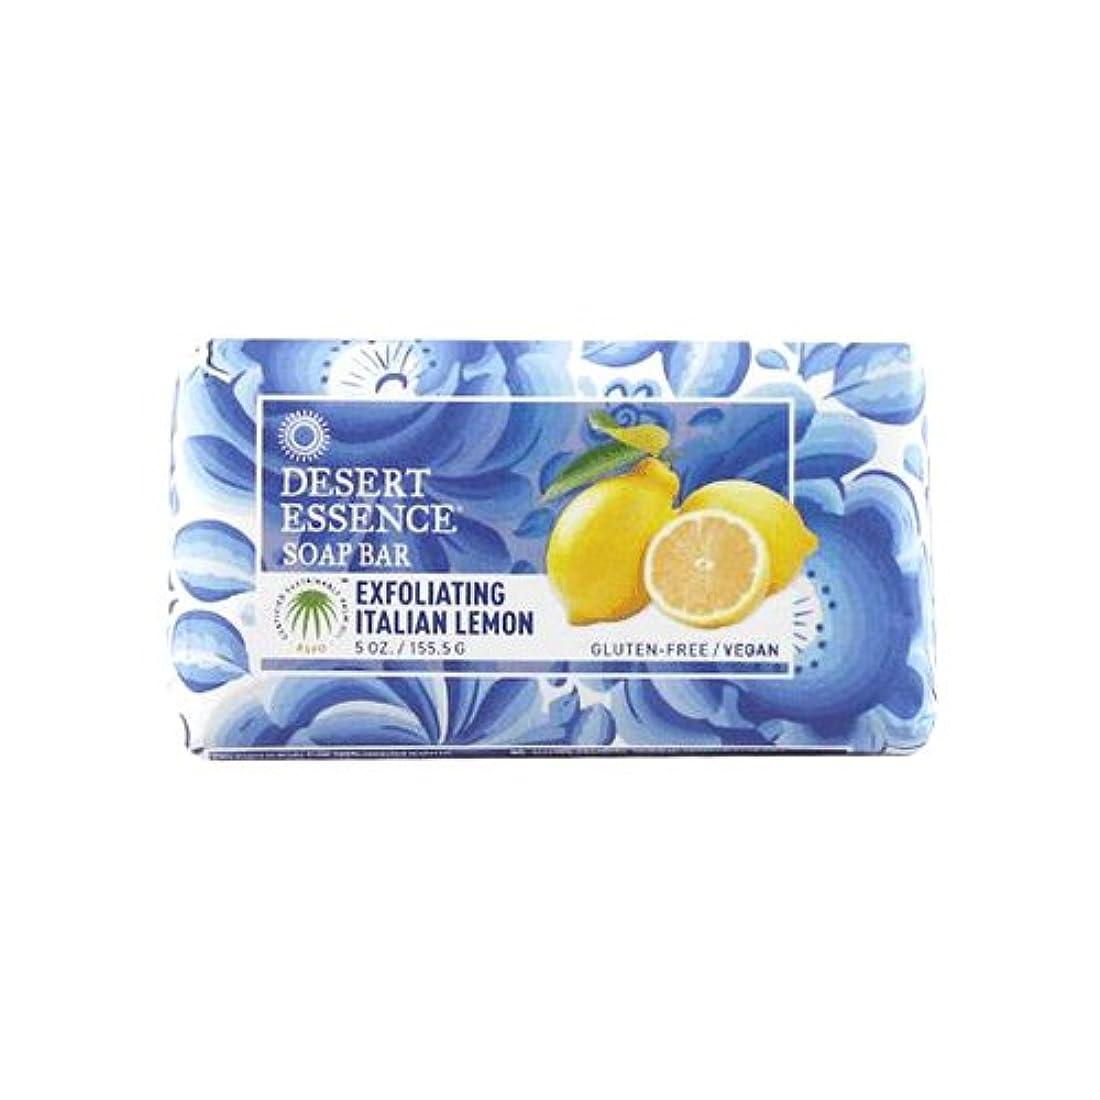 行列比較的忠実Desert Essence Bar Soap - Exfoliating Italian Lemon - 5 oz